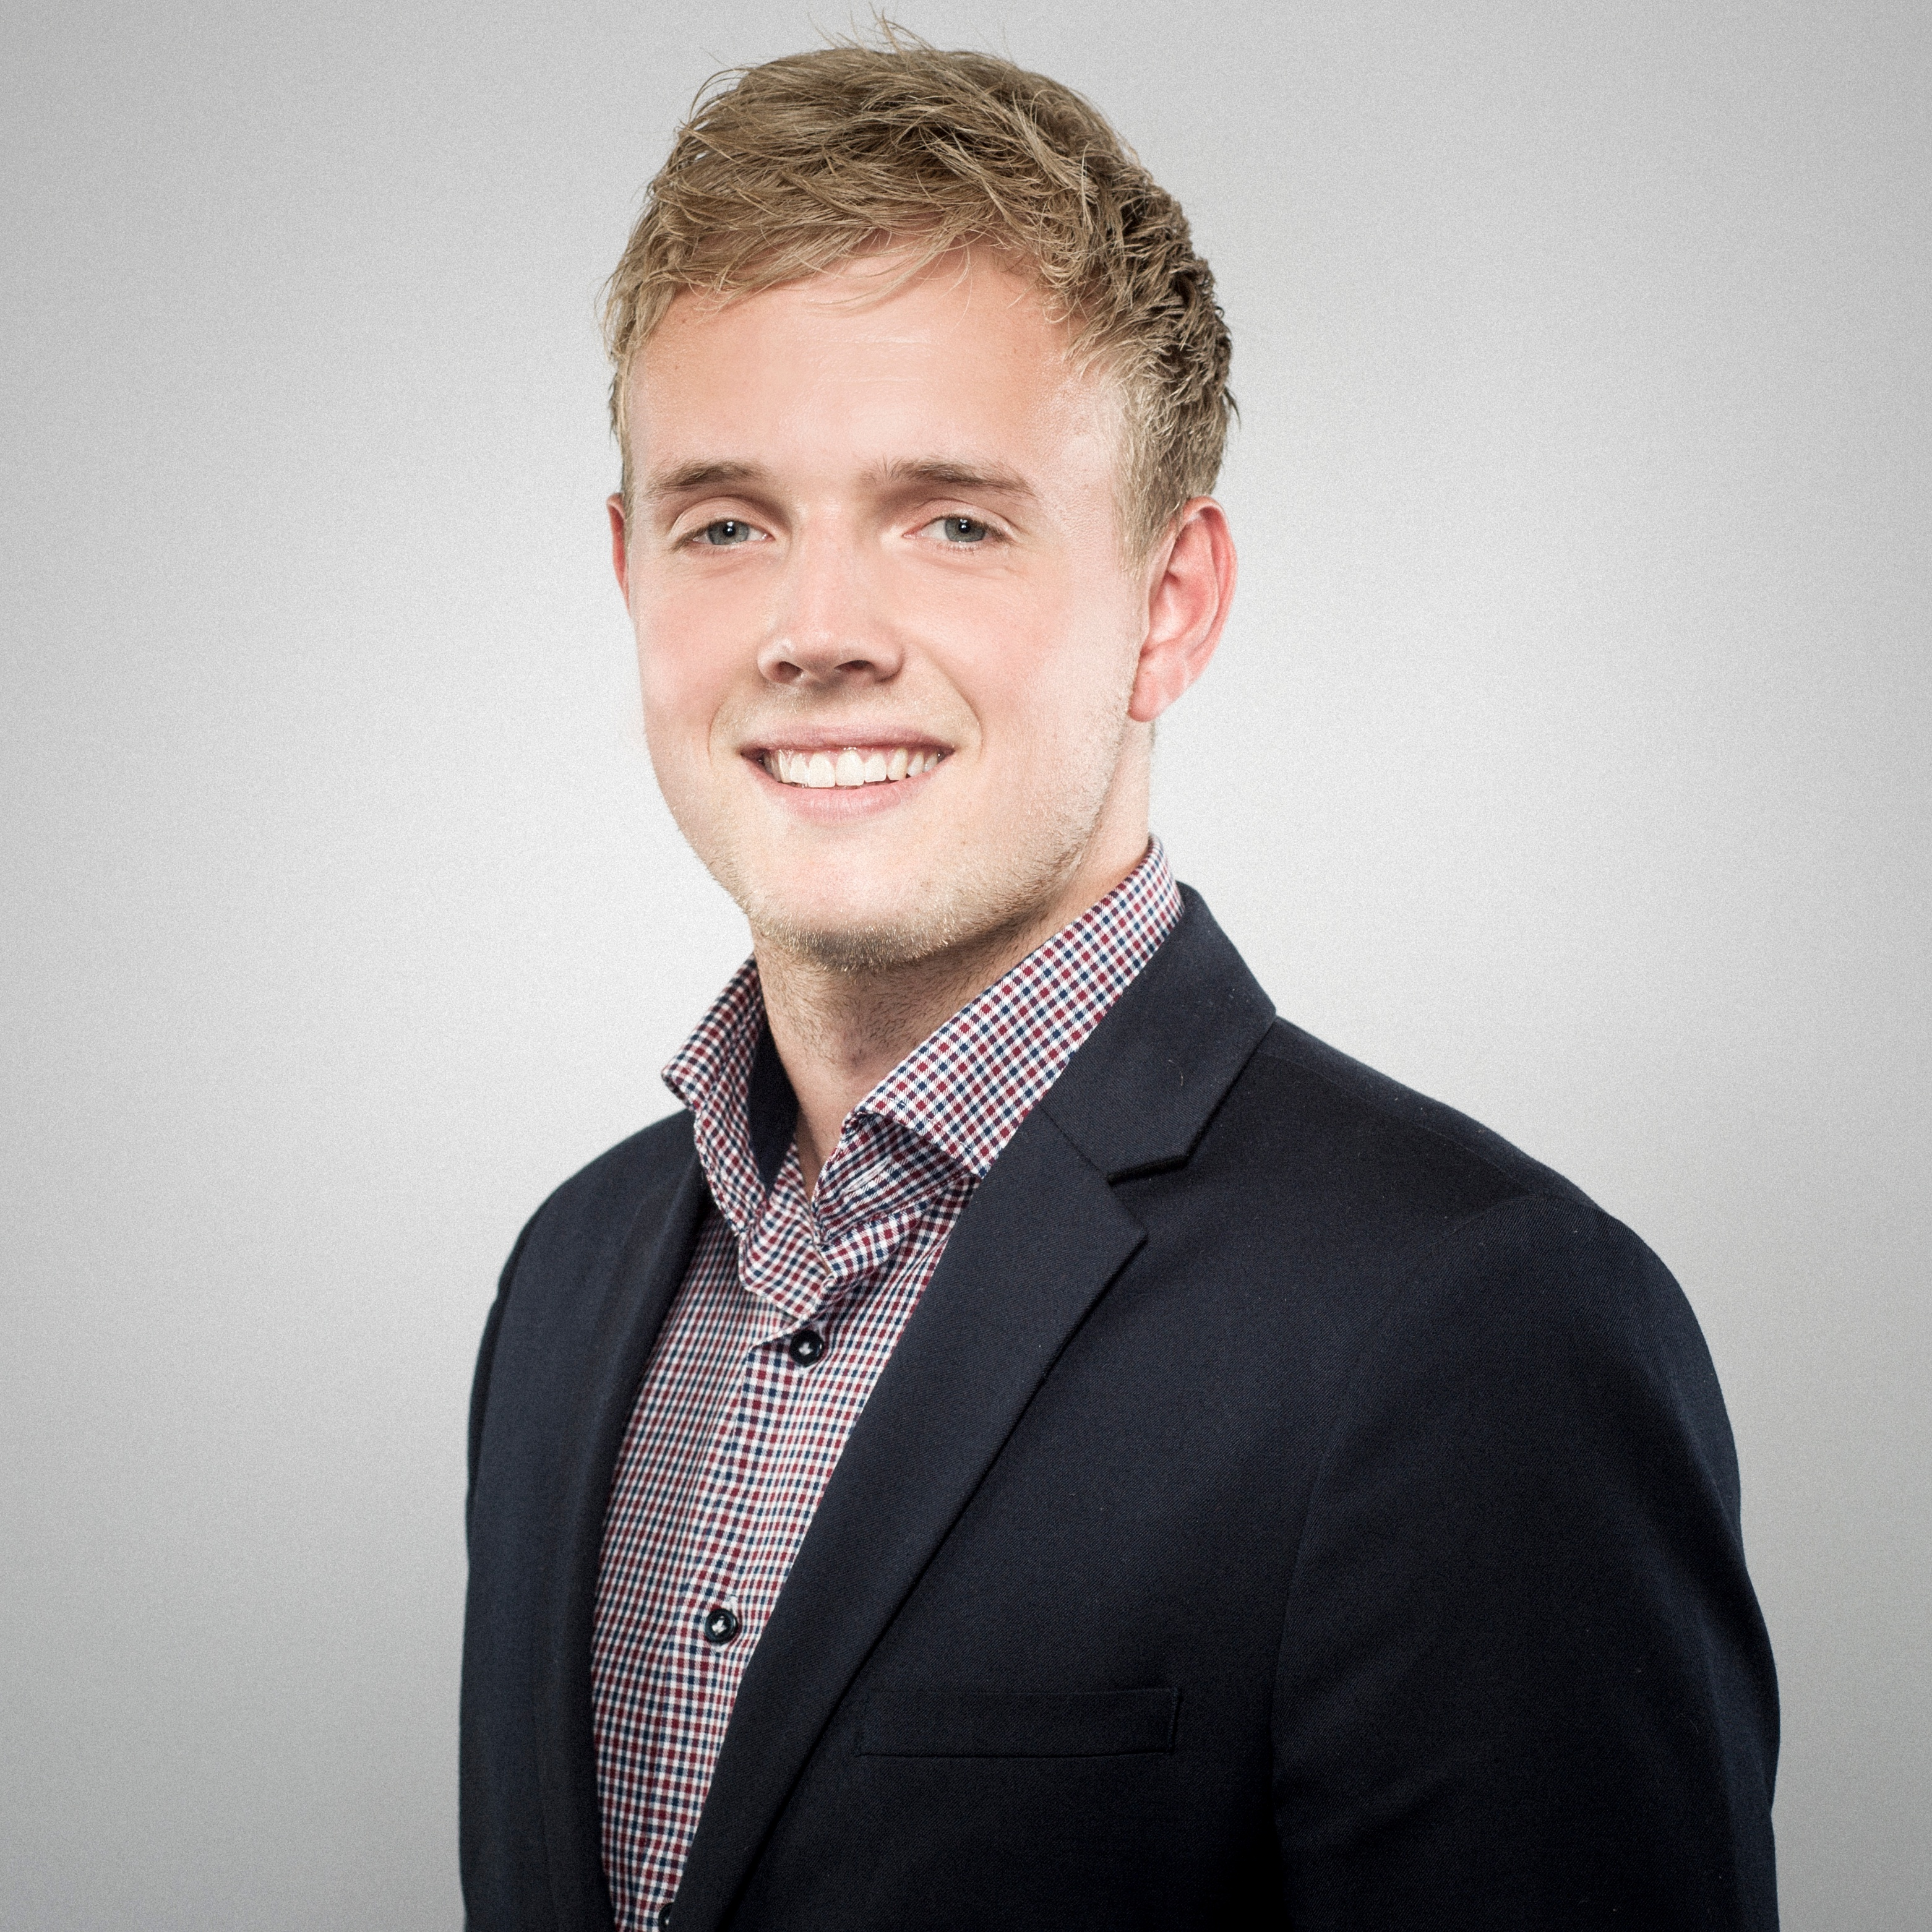 Collin de Boer, Business Developer